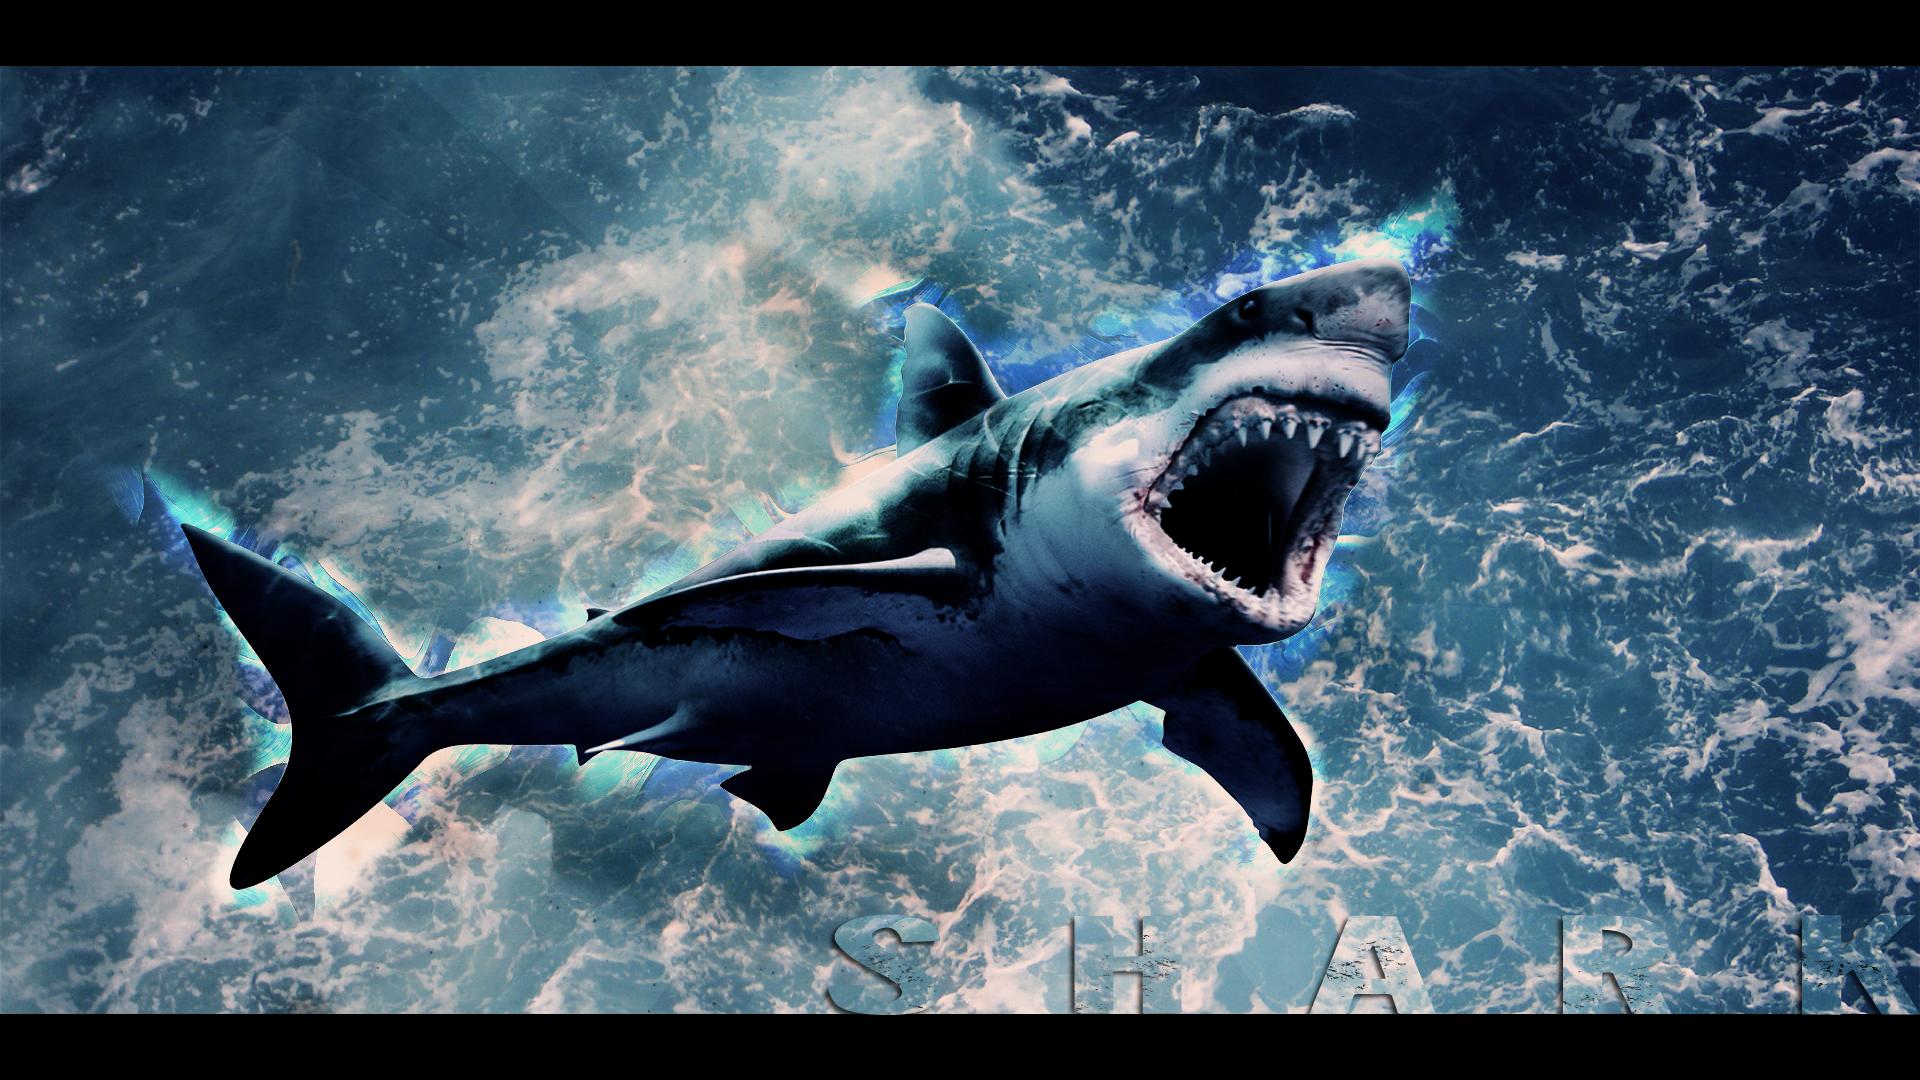 Shark Wallpaper HD by Tooyp 1920x1080